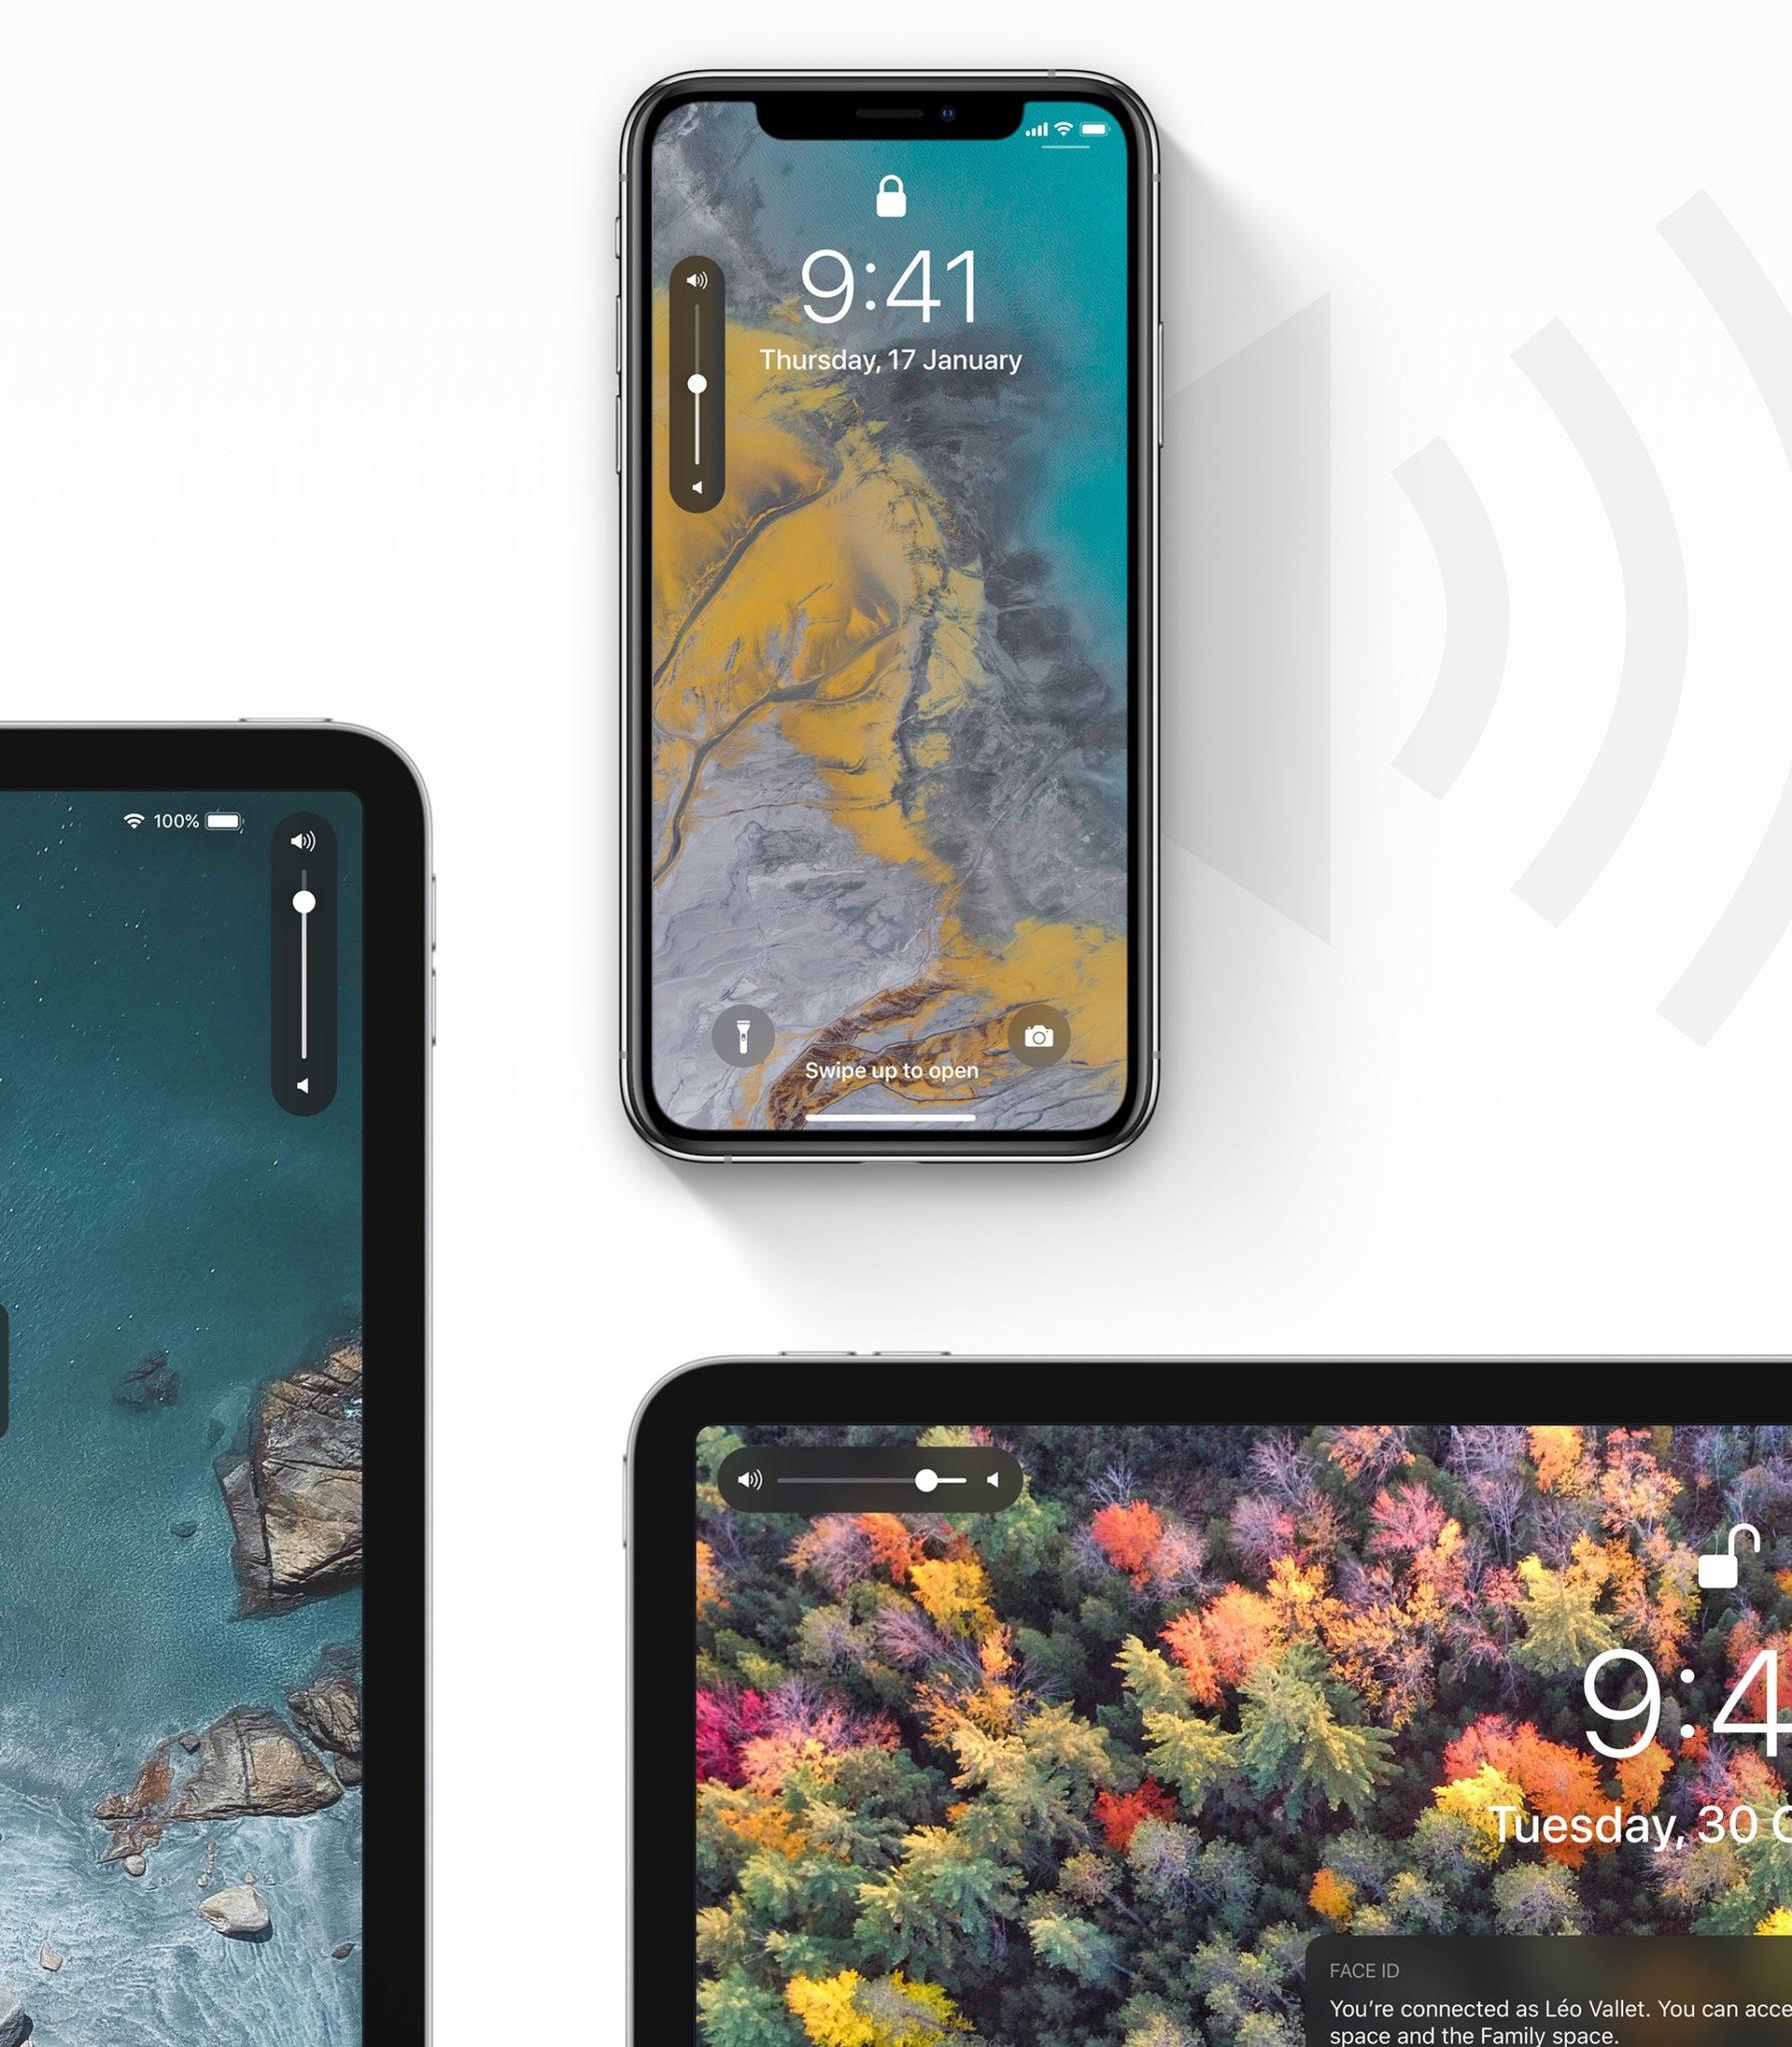 ios 13 concept leo vallet1 - iOS 13: krásny koncept ukazuje, ako by mohla vyzerať podpora Magic Mouse na iPade